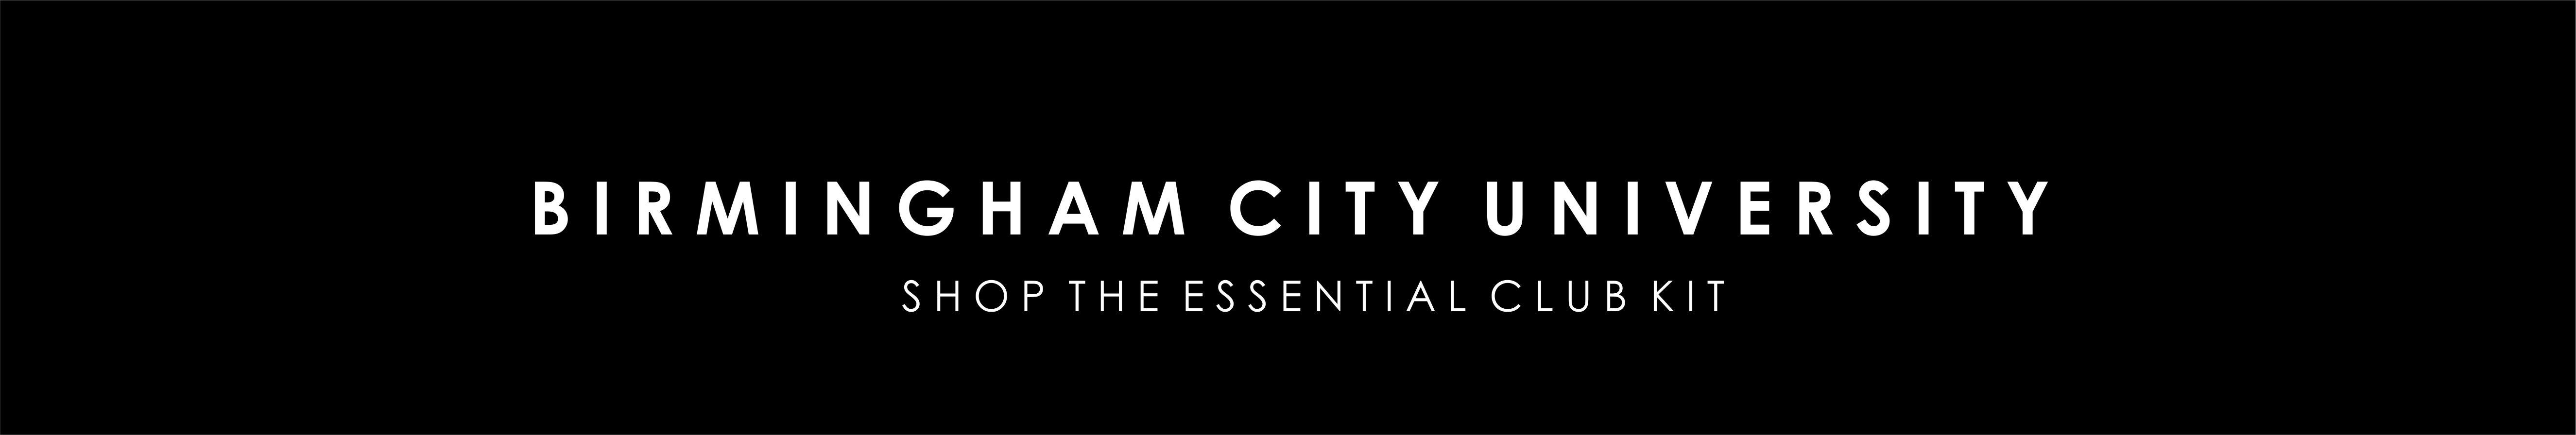 birmingham-city-university-banner.jpg